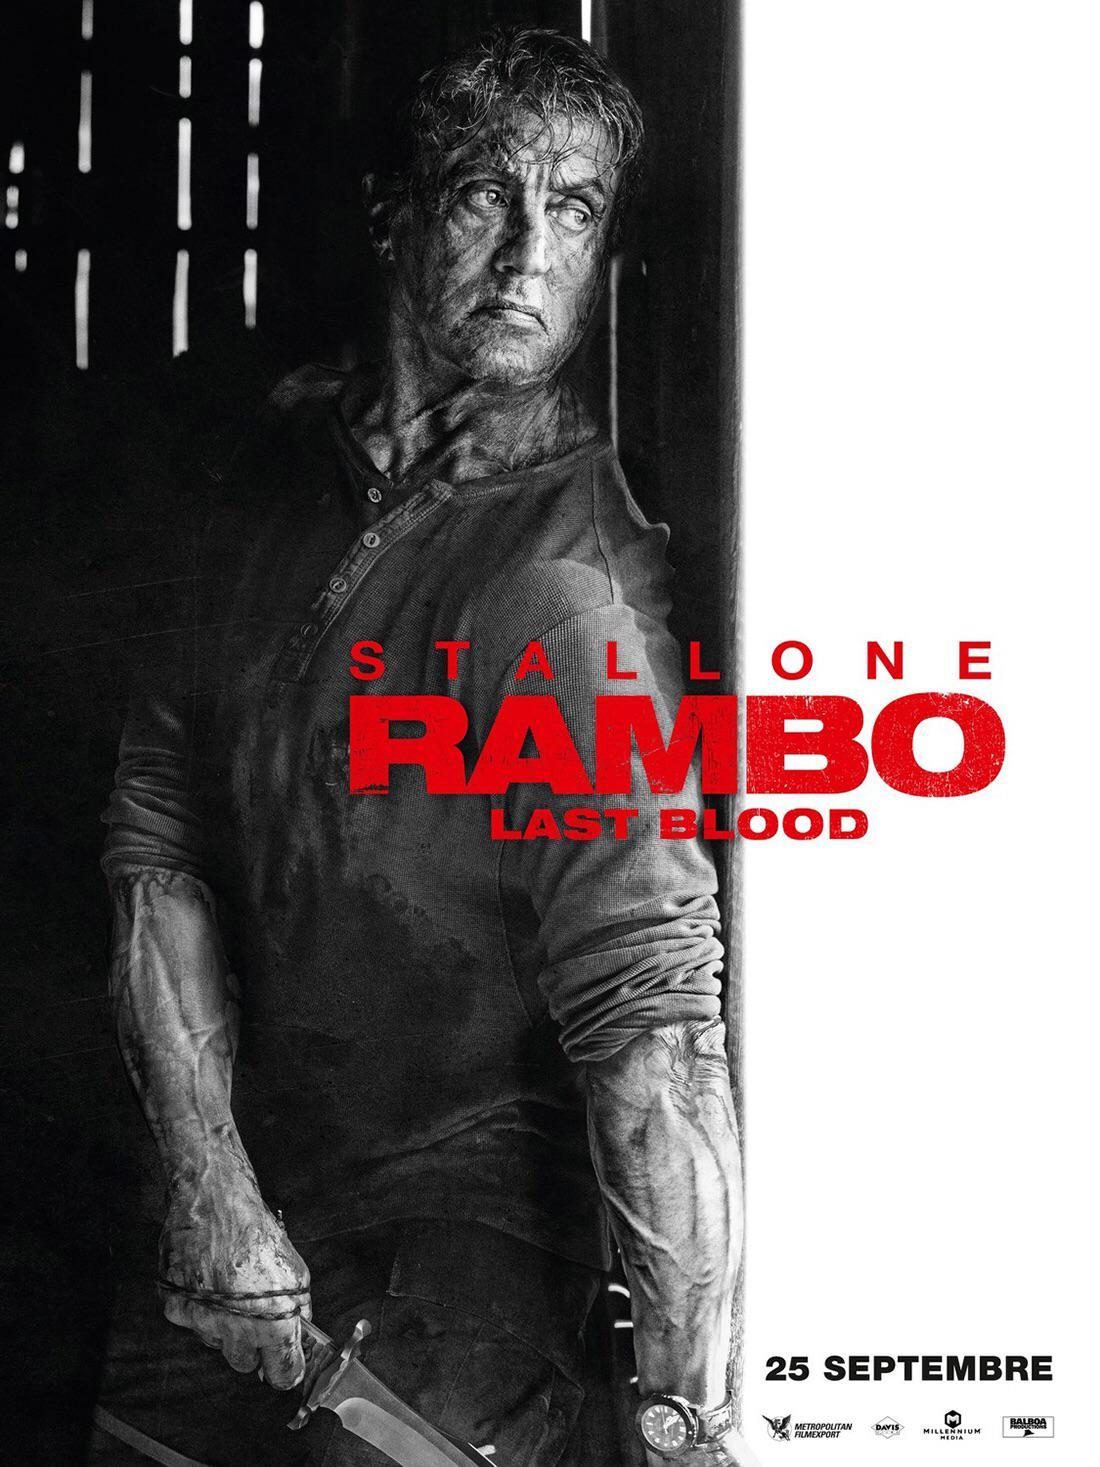 Rambo 5 last blood poster